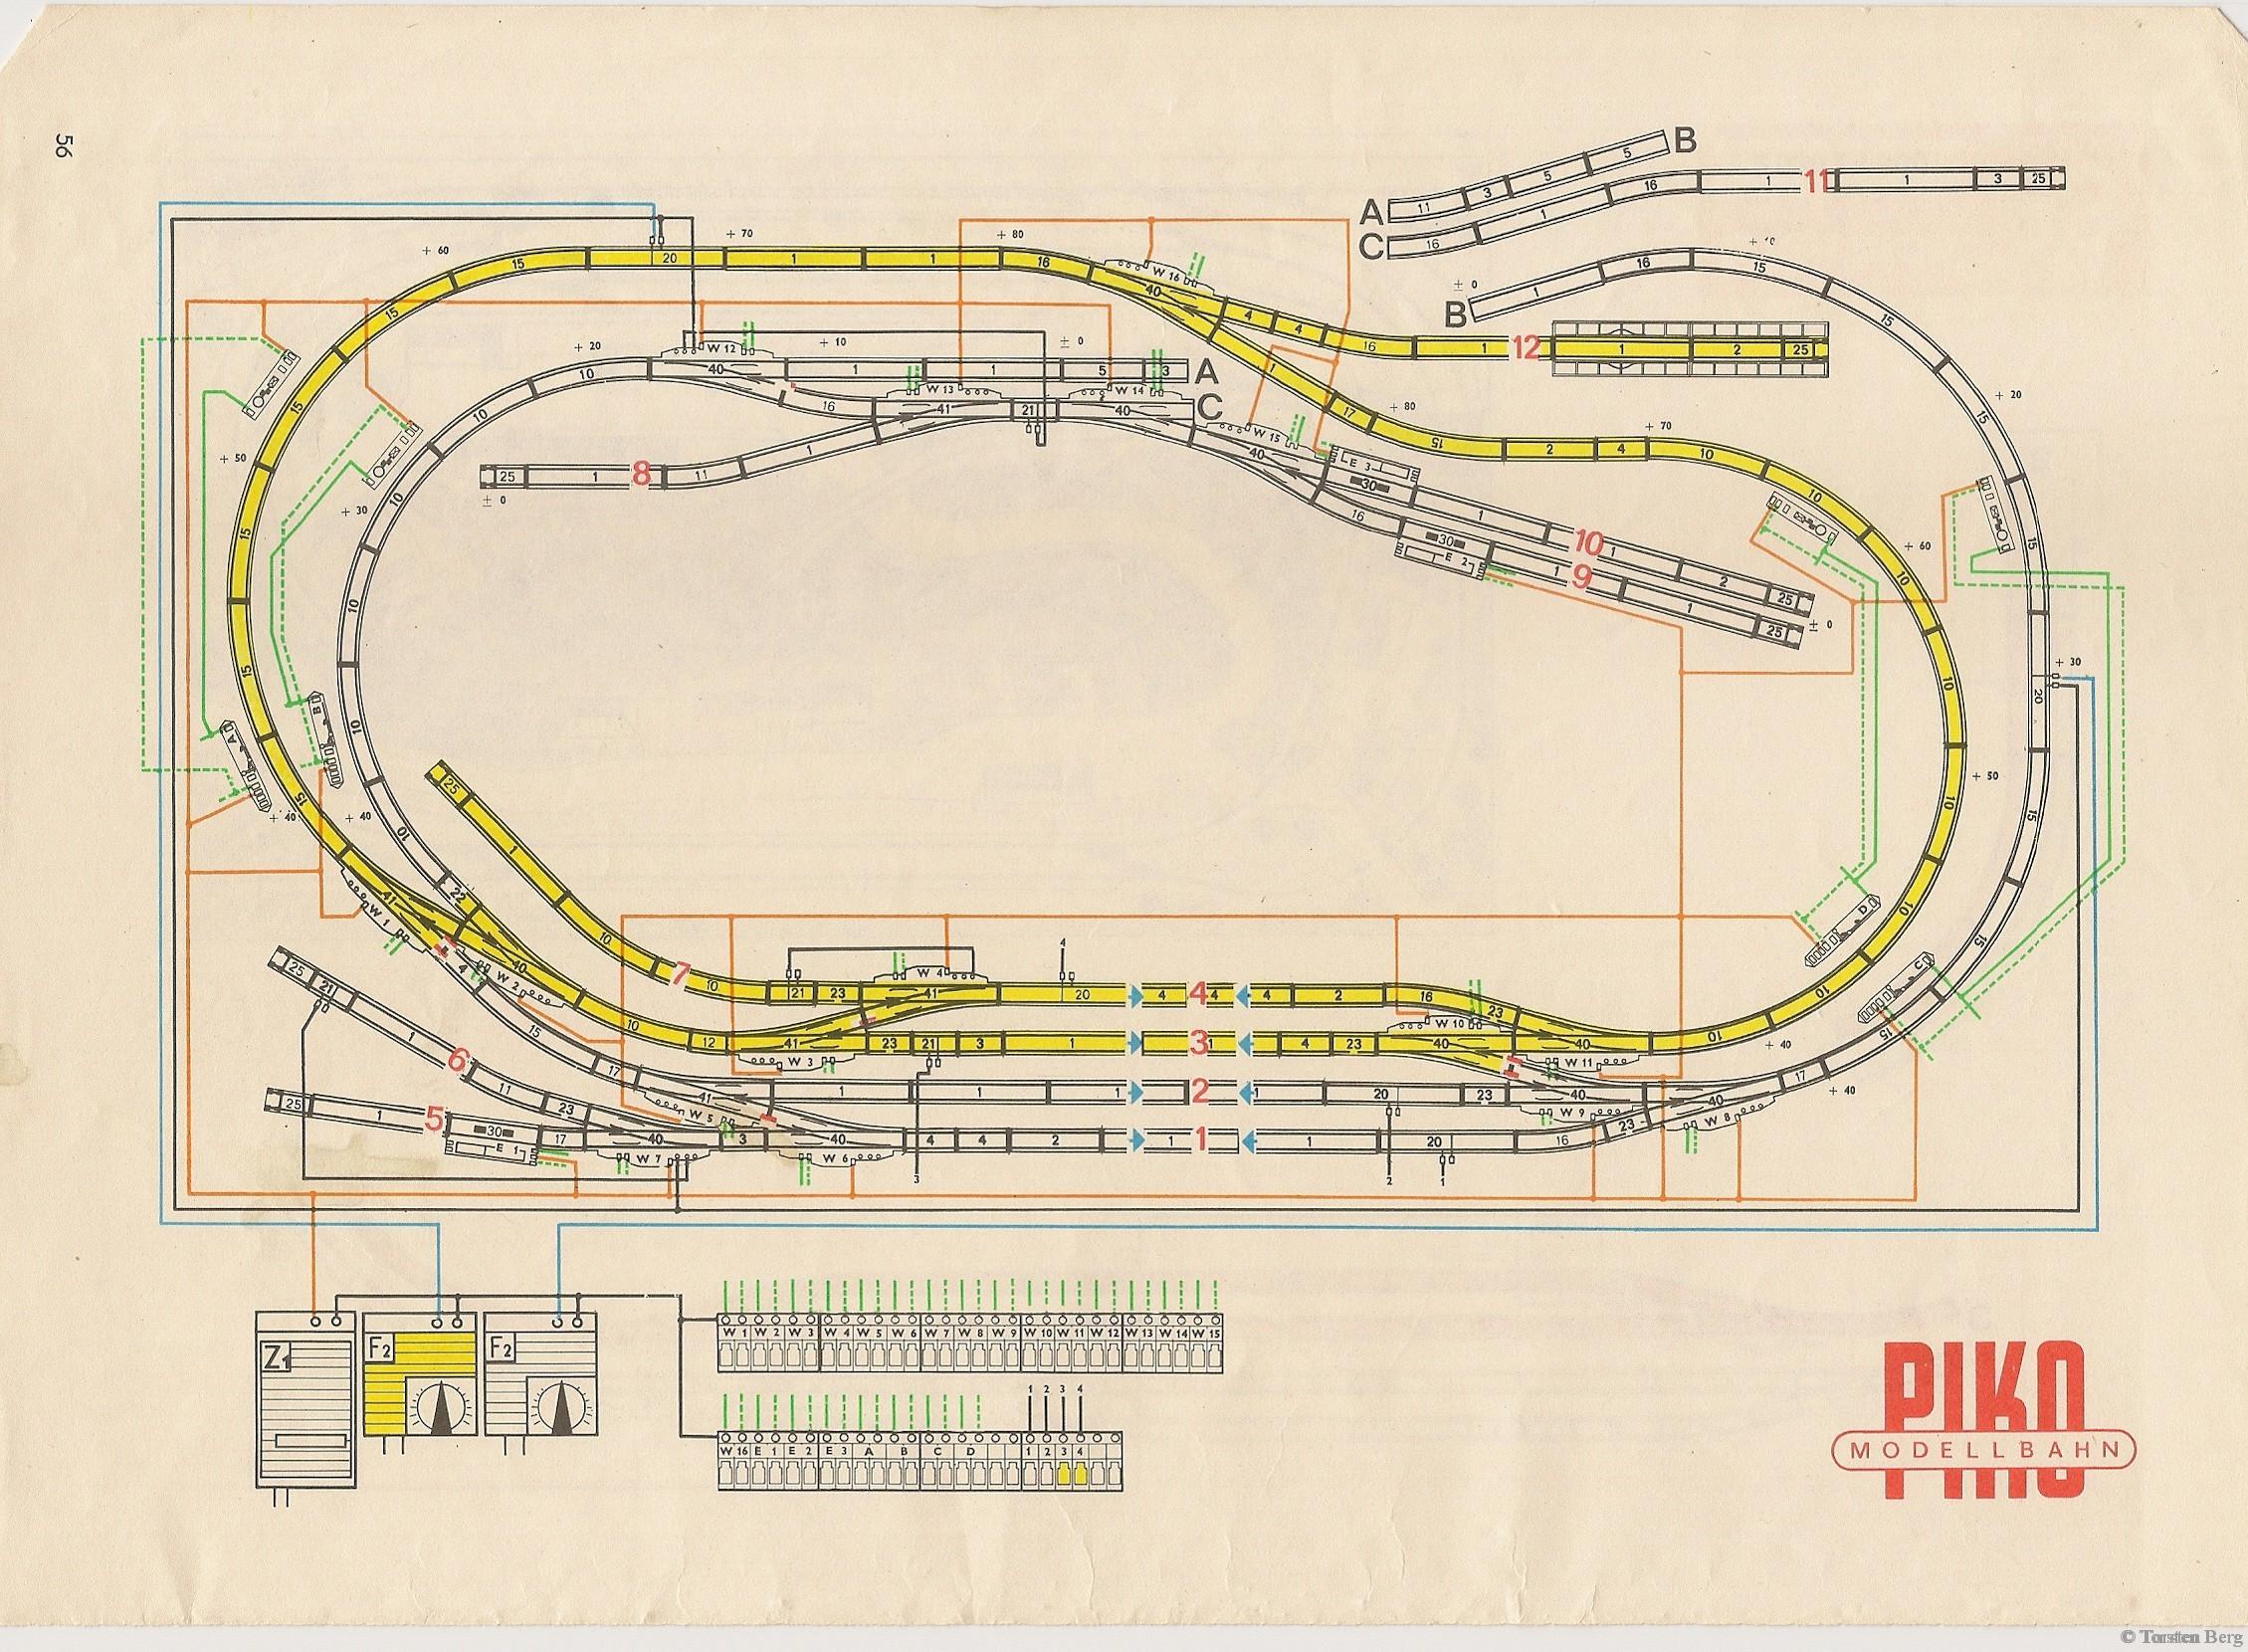 57 PIKO Standardgleis-Gleisplan 34